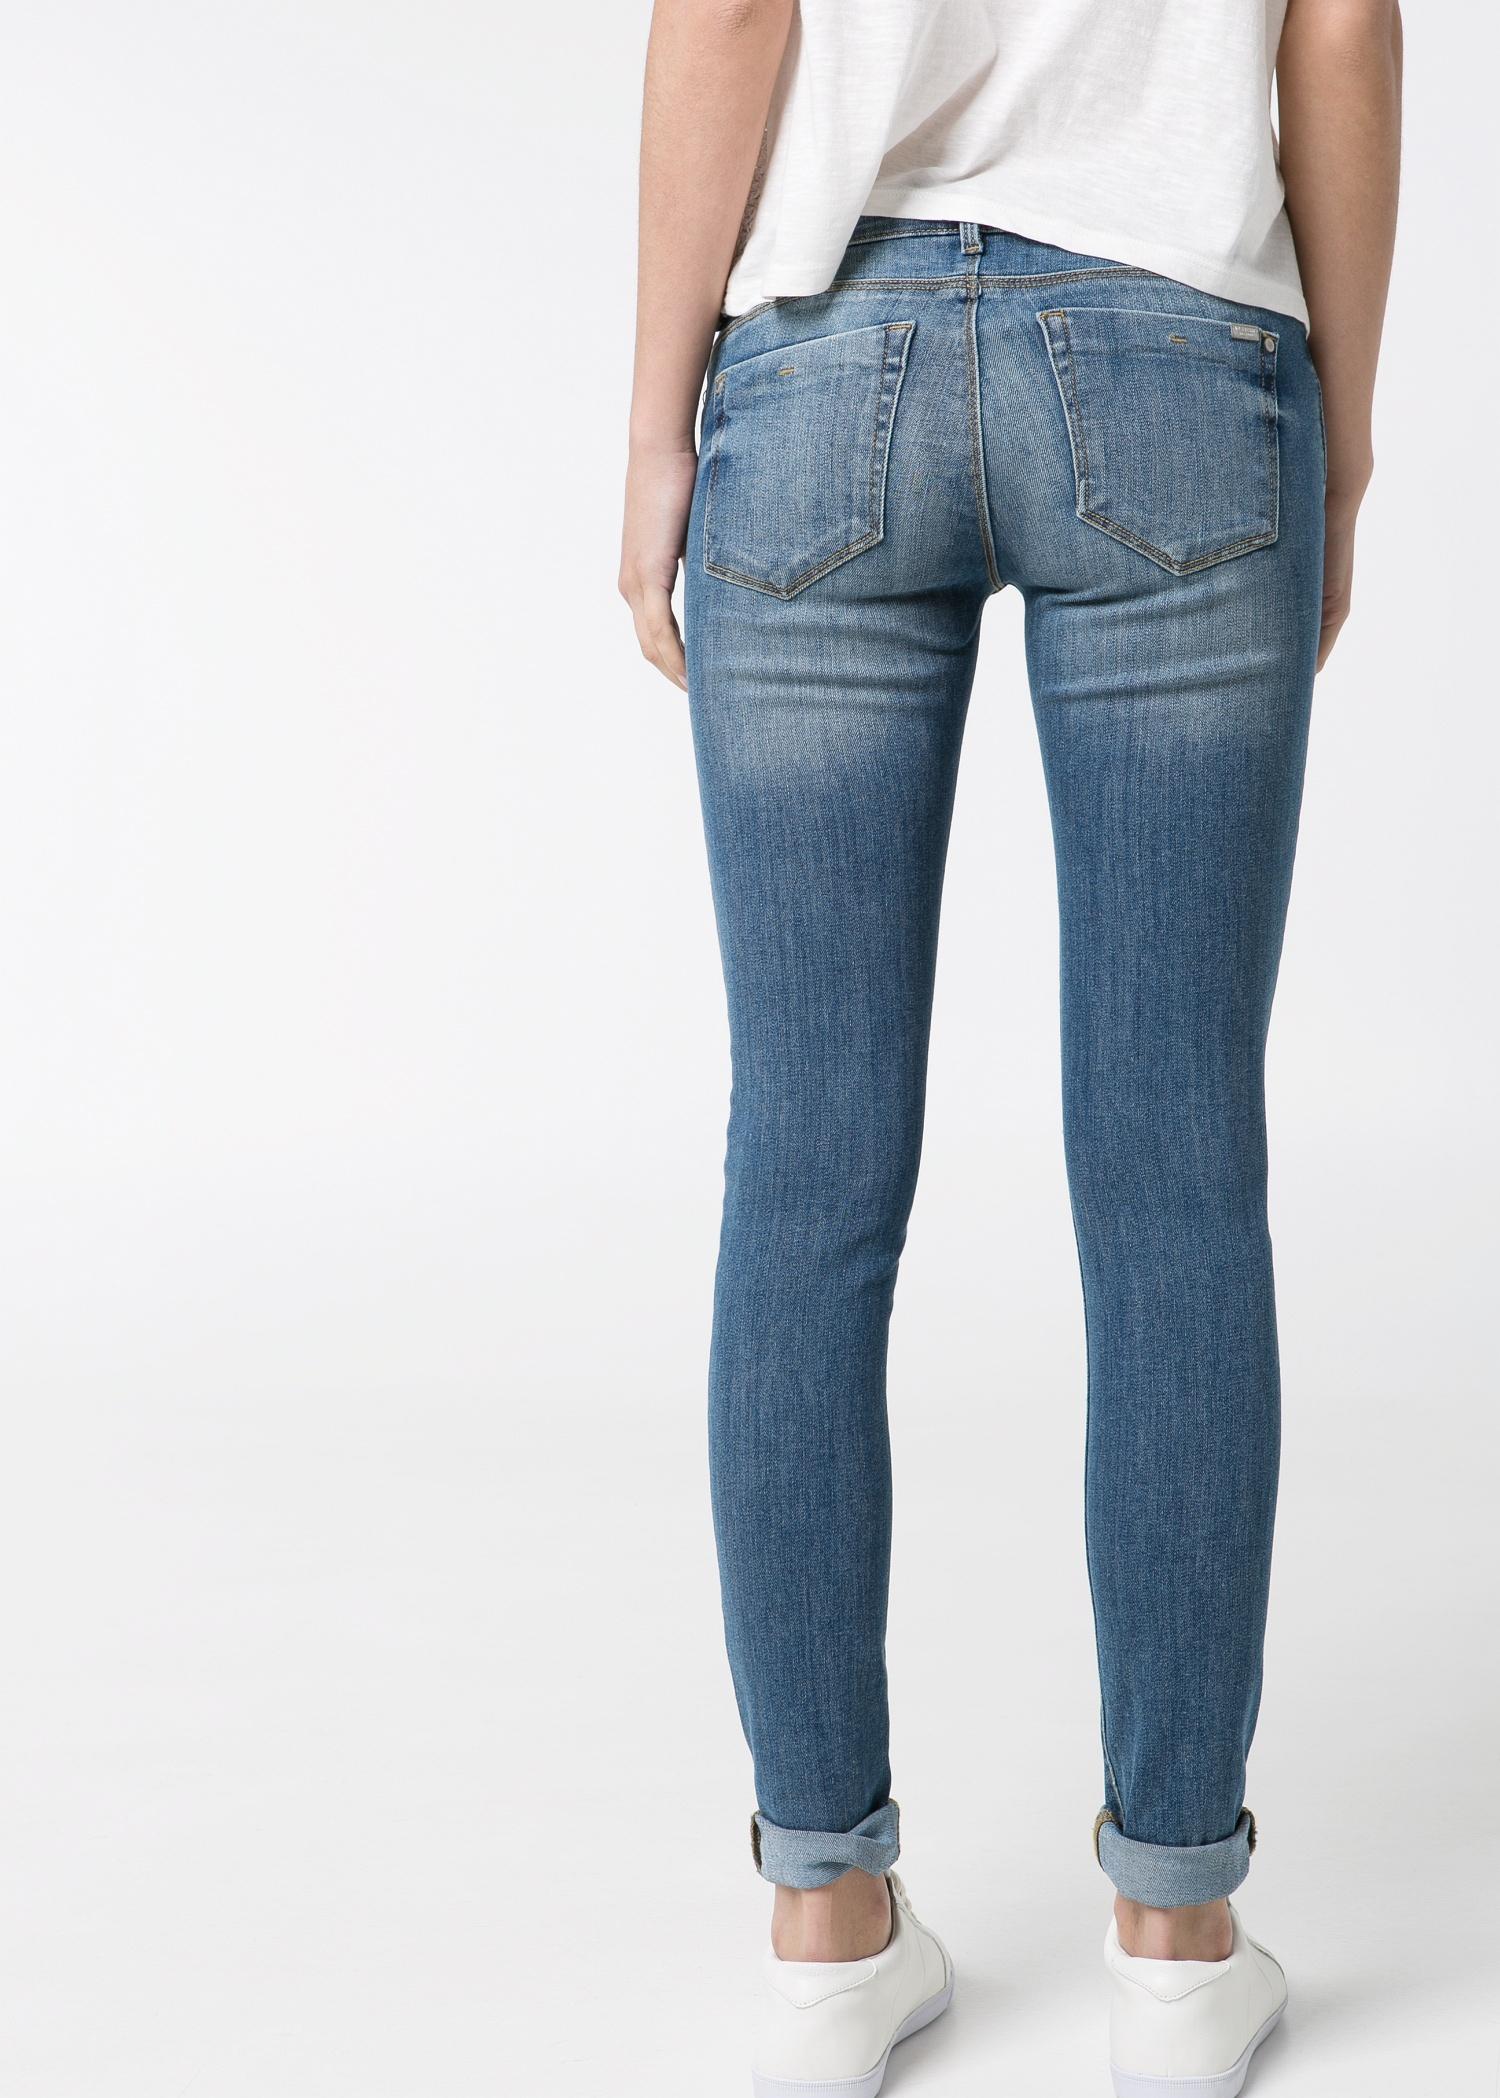 Mango Skinny Olivia Jeans in Blue